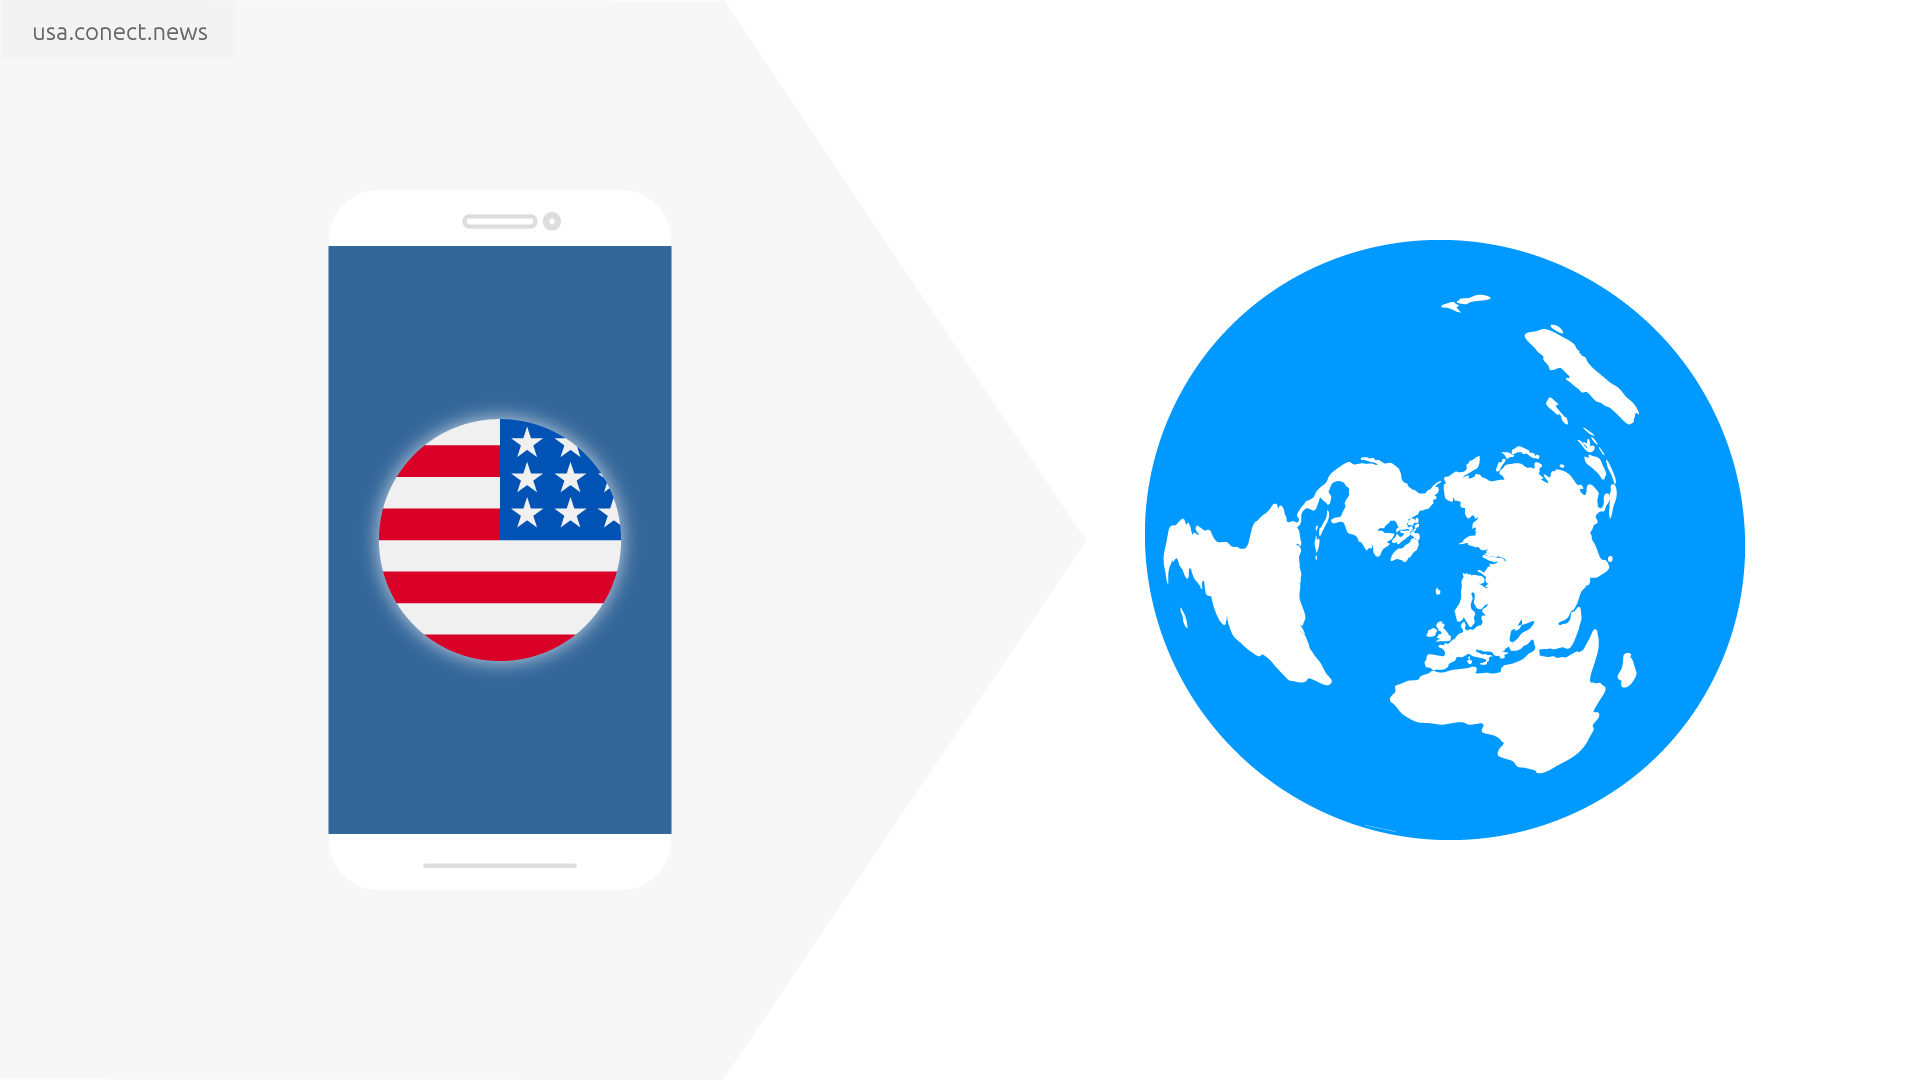 USA-international@conect_news